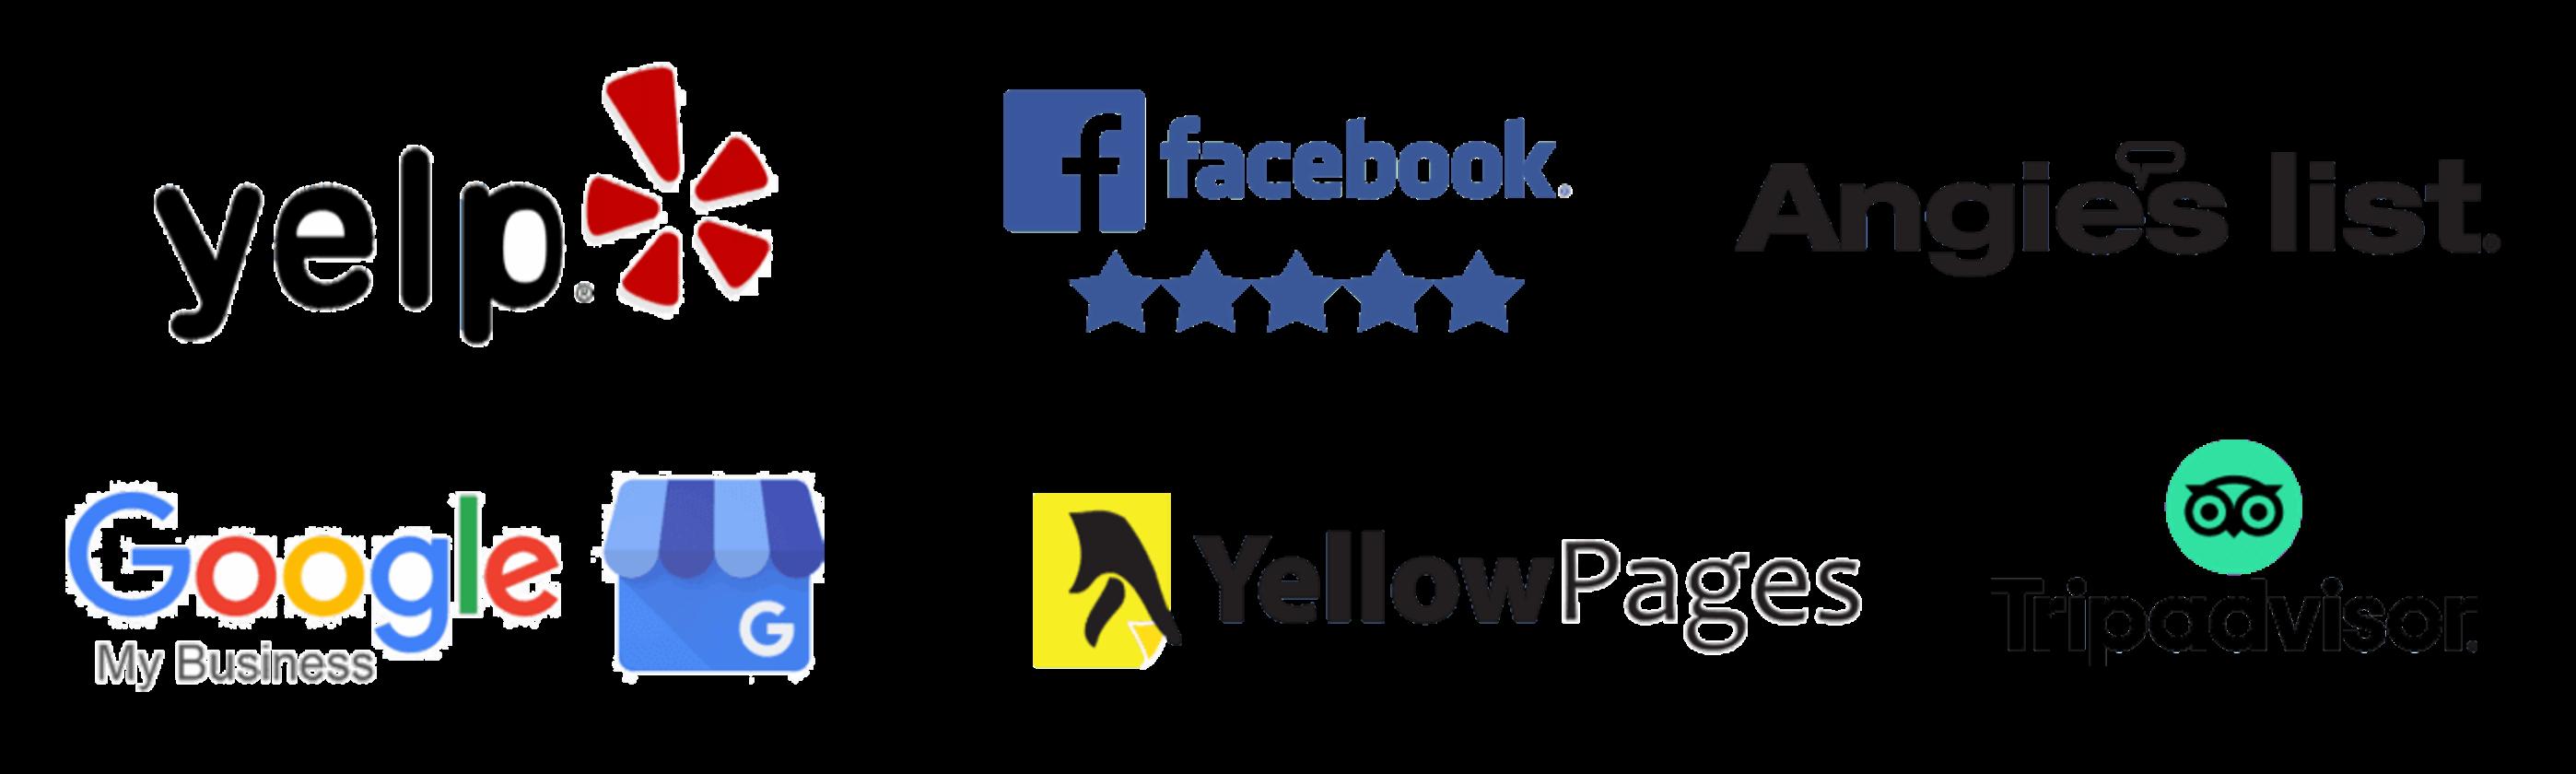 Review Site Logos